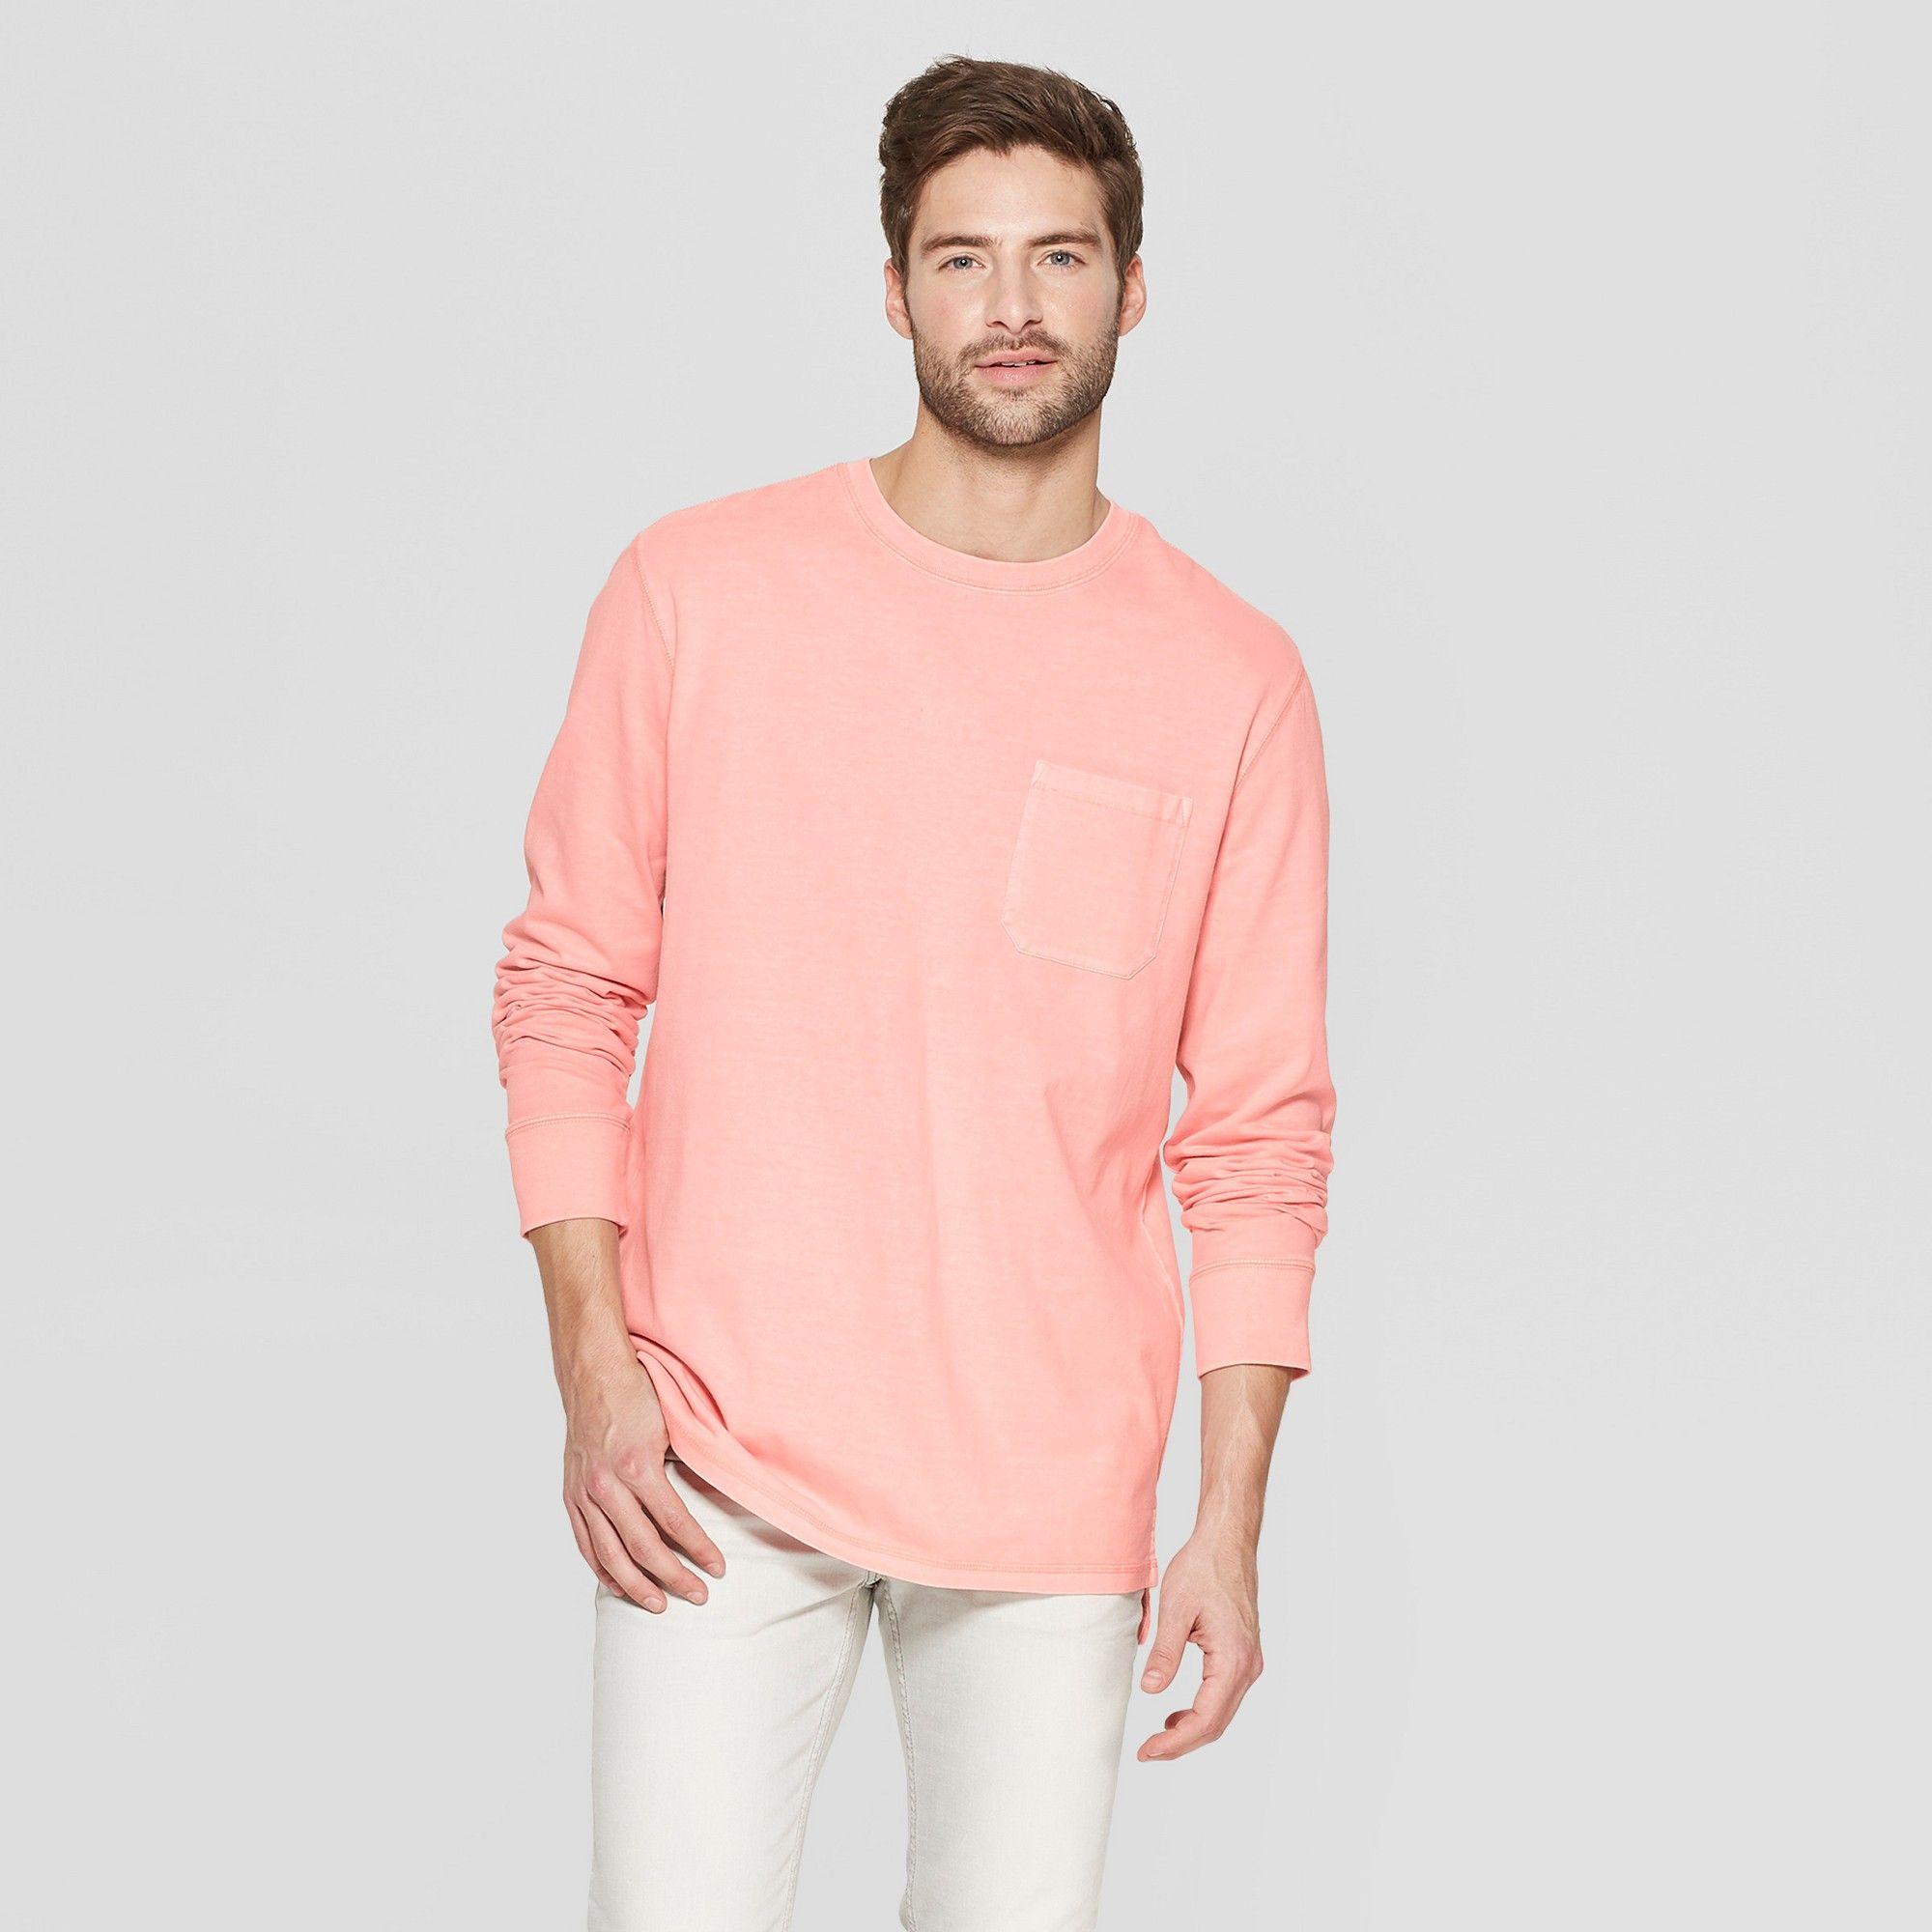 03352a63 Men's Standard Fit Long Sleeve Garment Dye Pocket T-Shirt - Goodfellow & Co  Coral Bay XL